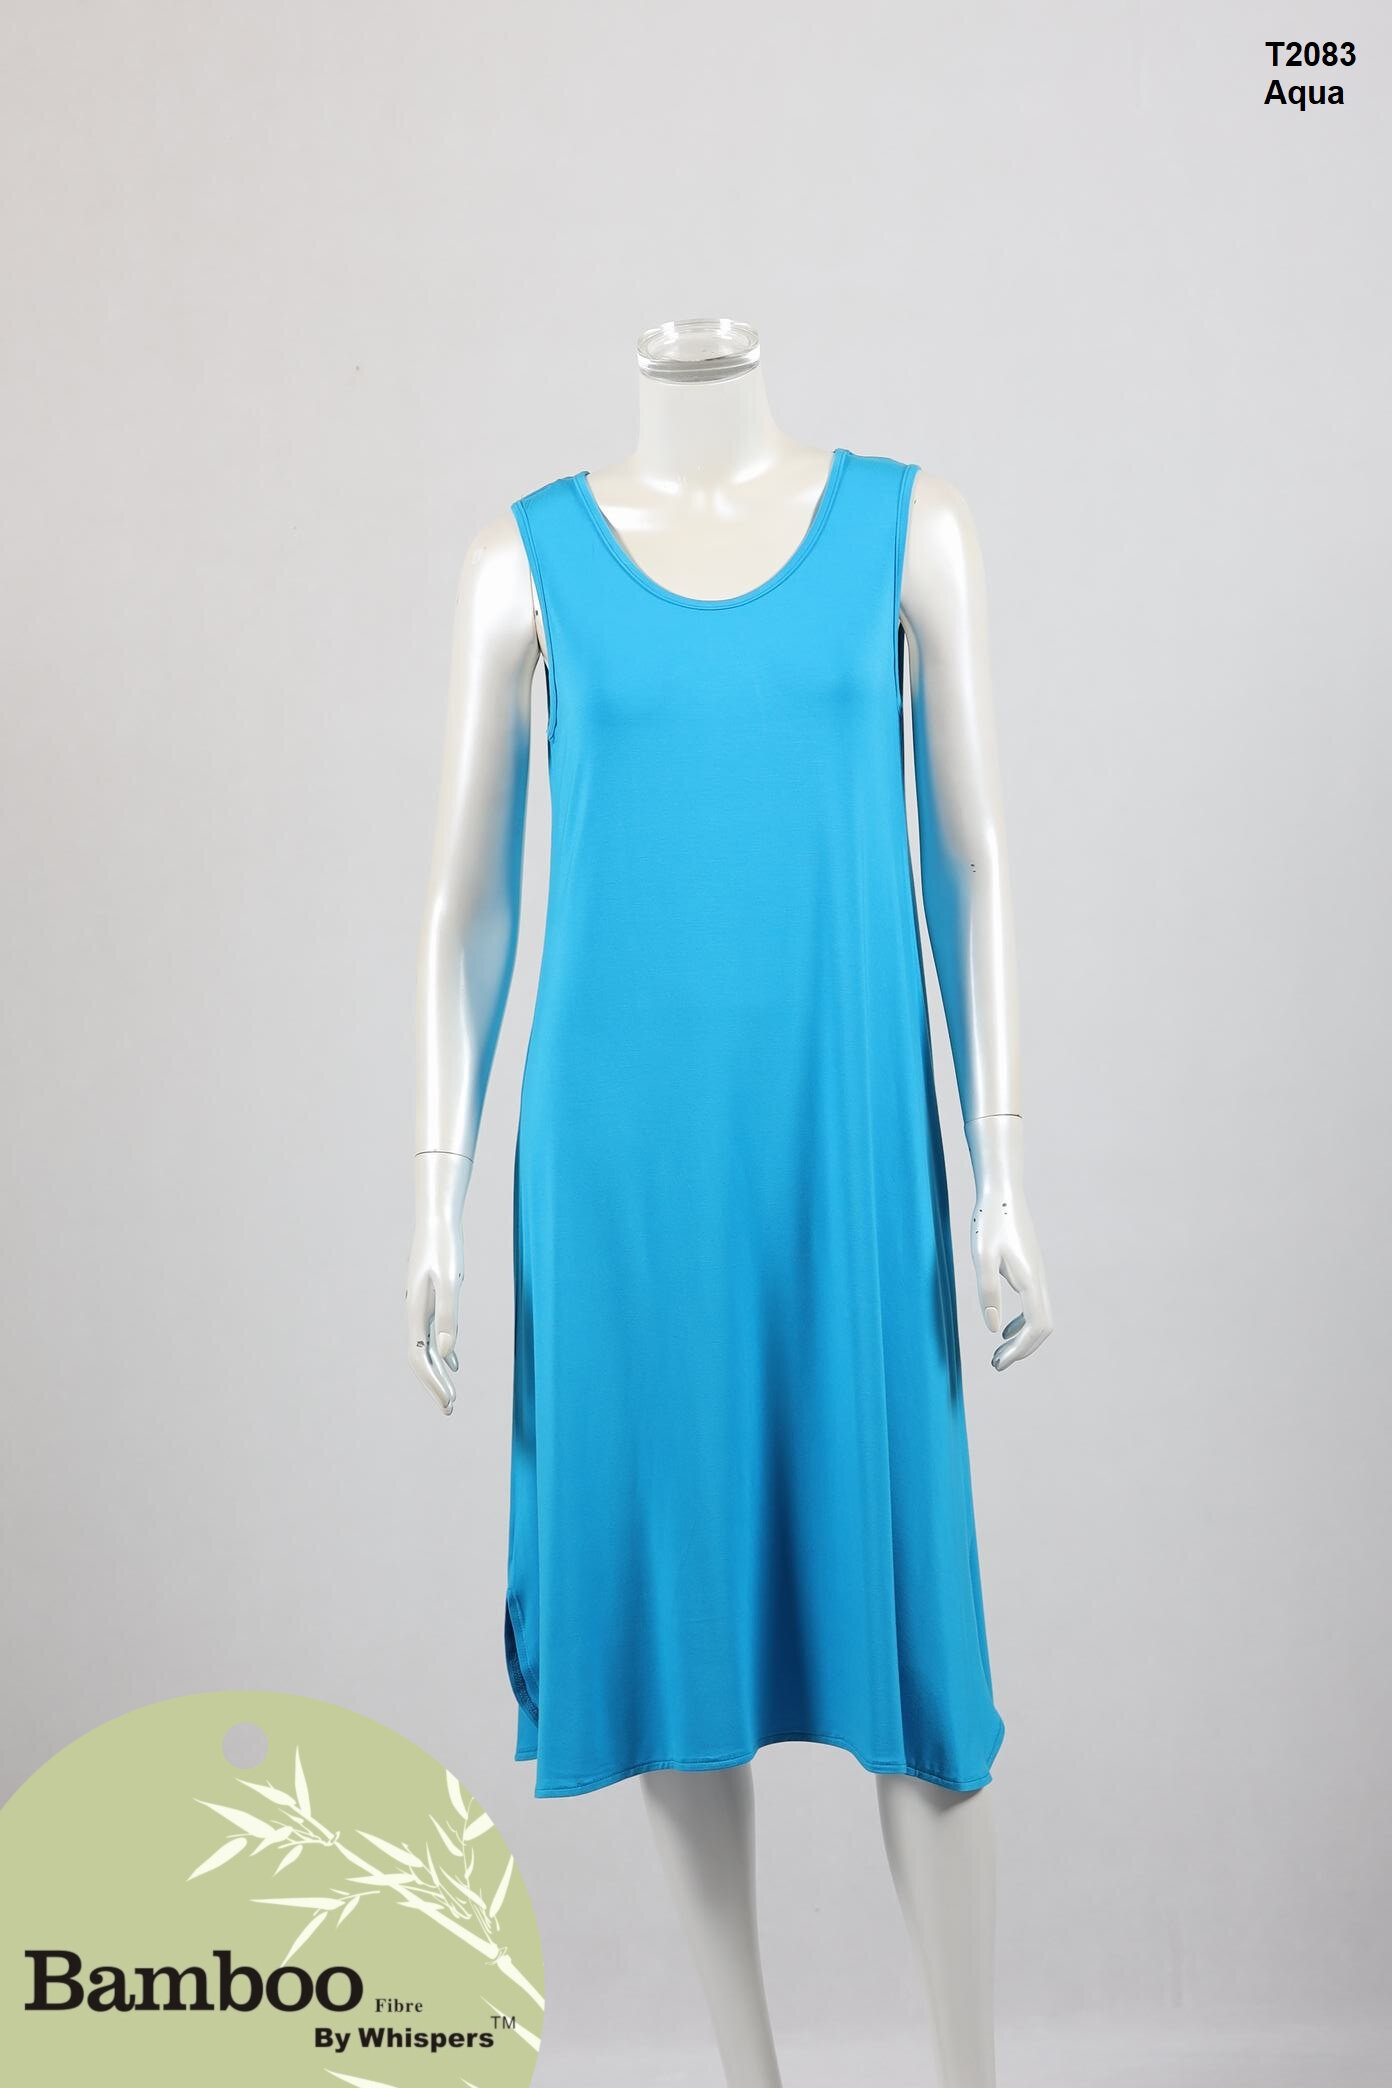 T2083-Bamboo Dress-Aqua.JPG